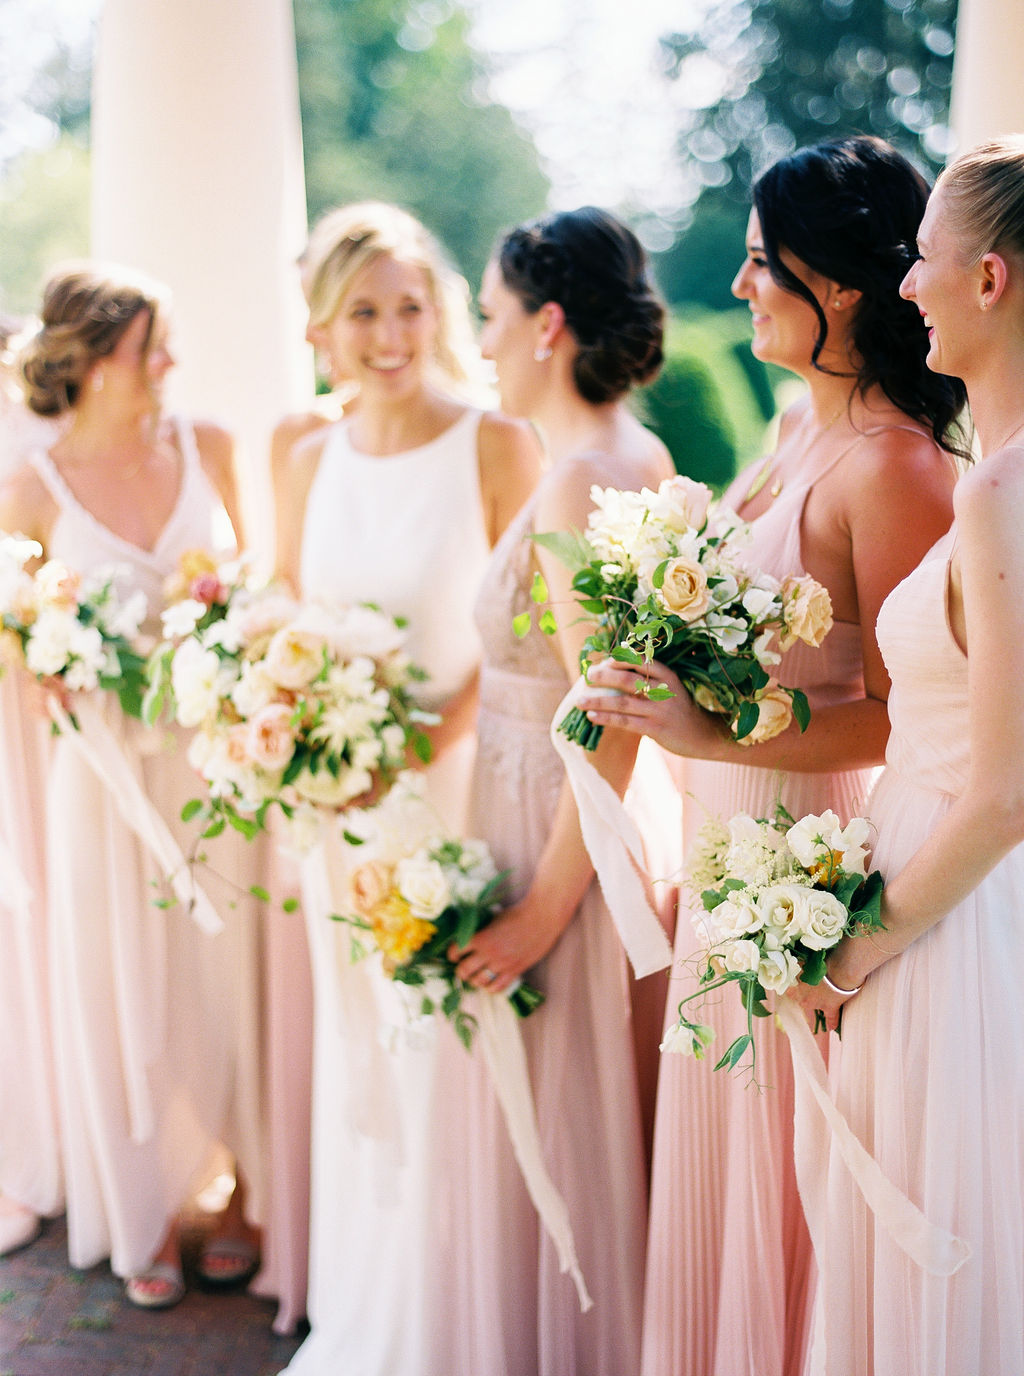 Alexandra-Elise-Photography-Film-Wedding-Photographer-Sonnenberg-Gardens-Finger-Lakes-Canandaigua-Wedding-Party-009.jpg